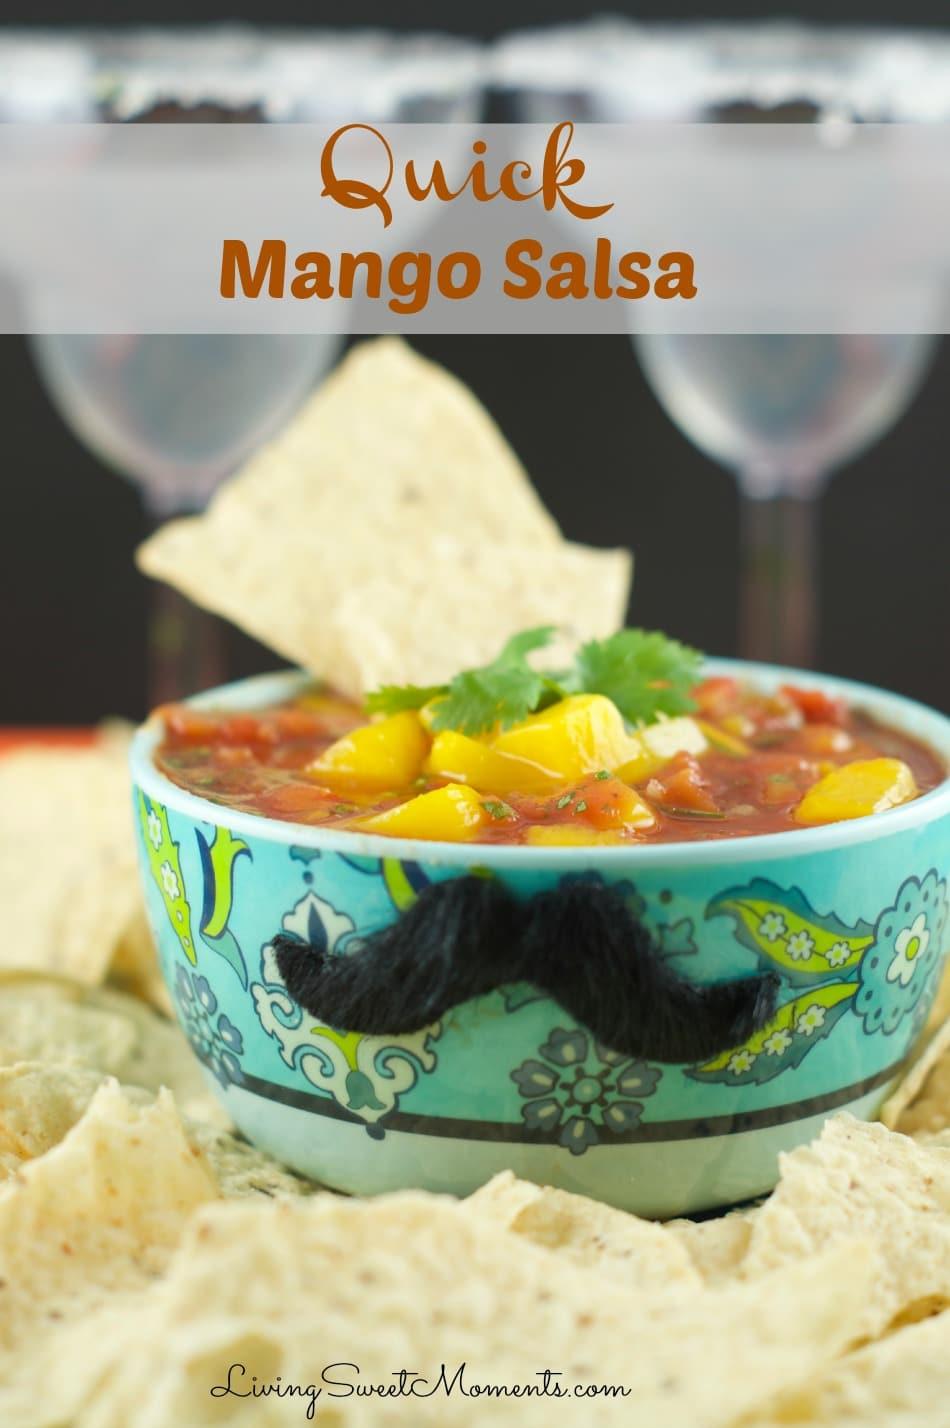 quick-mango-salsa-recipe-cover